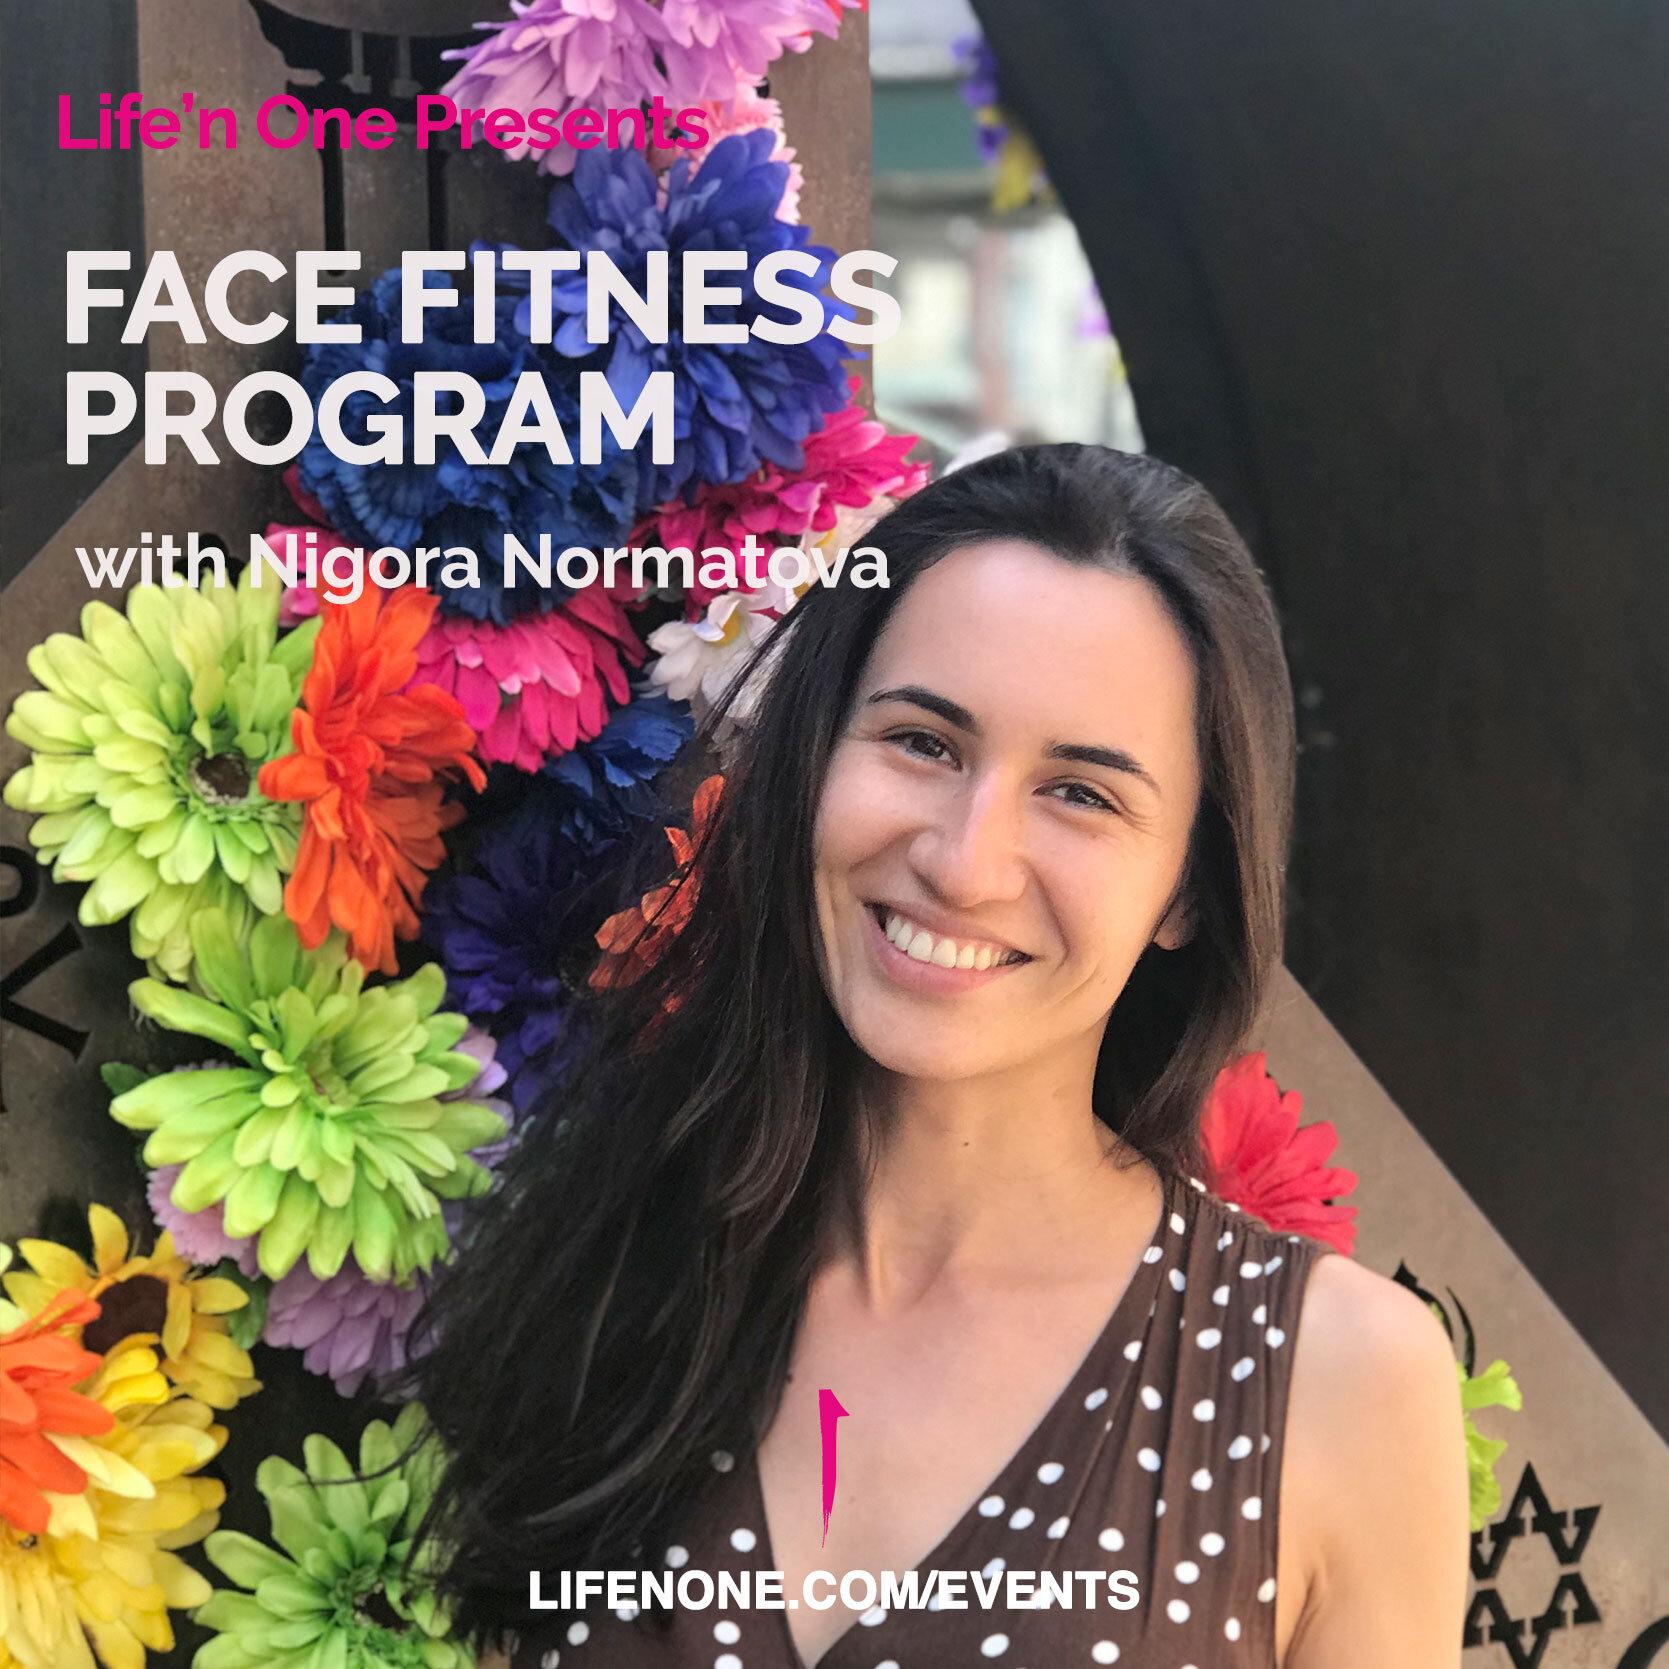 Face-fitness-group-program-with-nigora.jpg